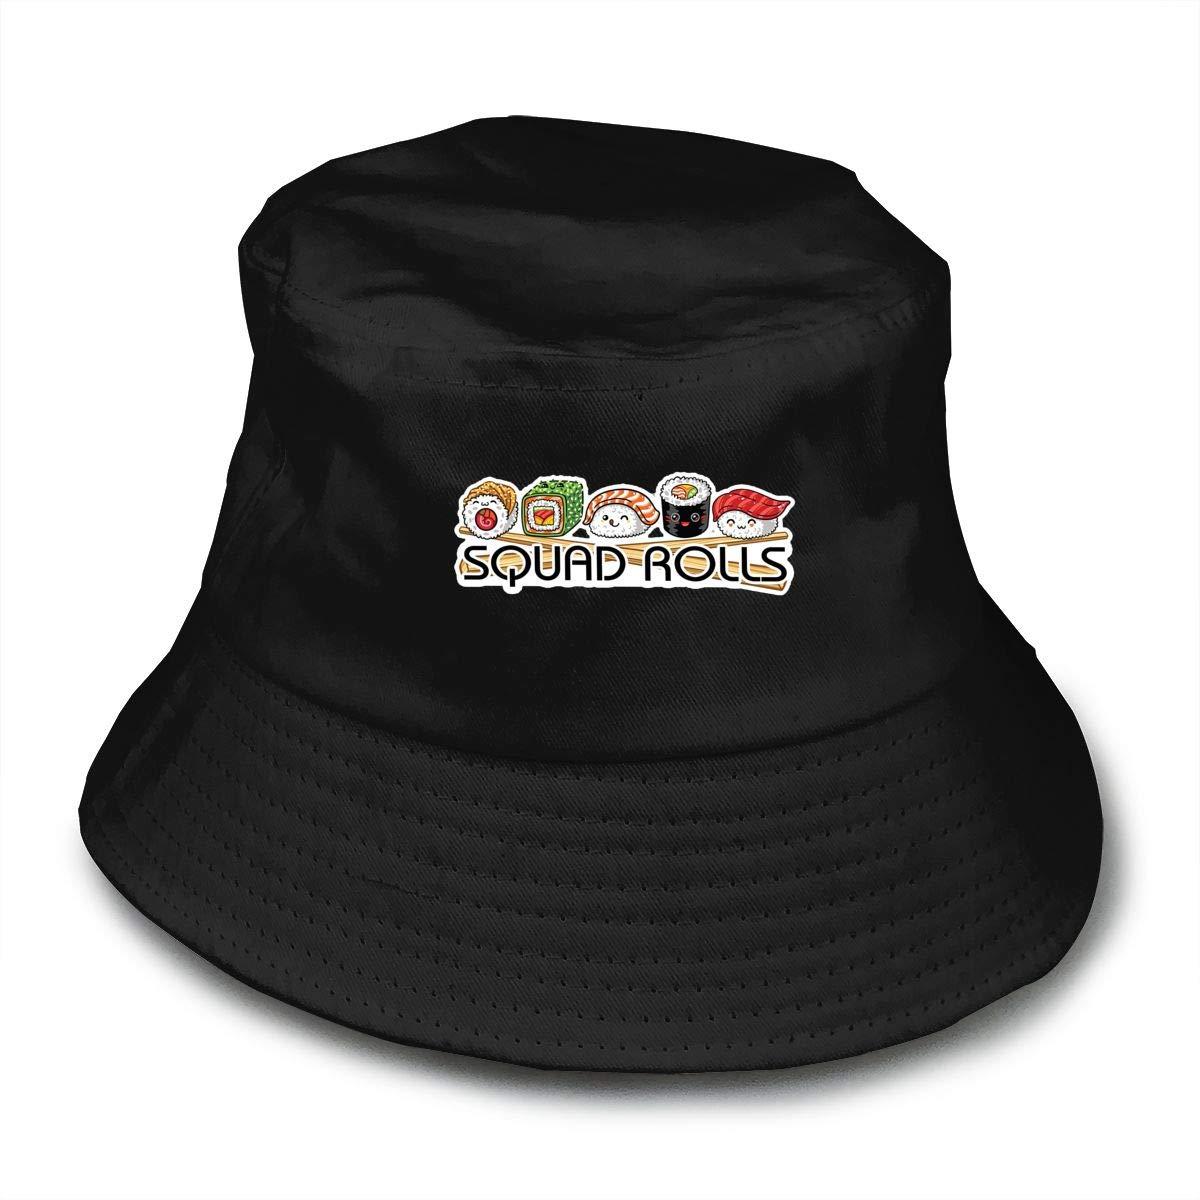 4686267731b Amazon.com  Unisex Cute Squad Rolls Sushi Bucket Hat Summer Fisherman Cap   Sports   Outdoors